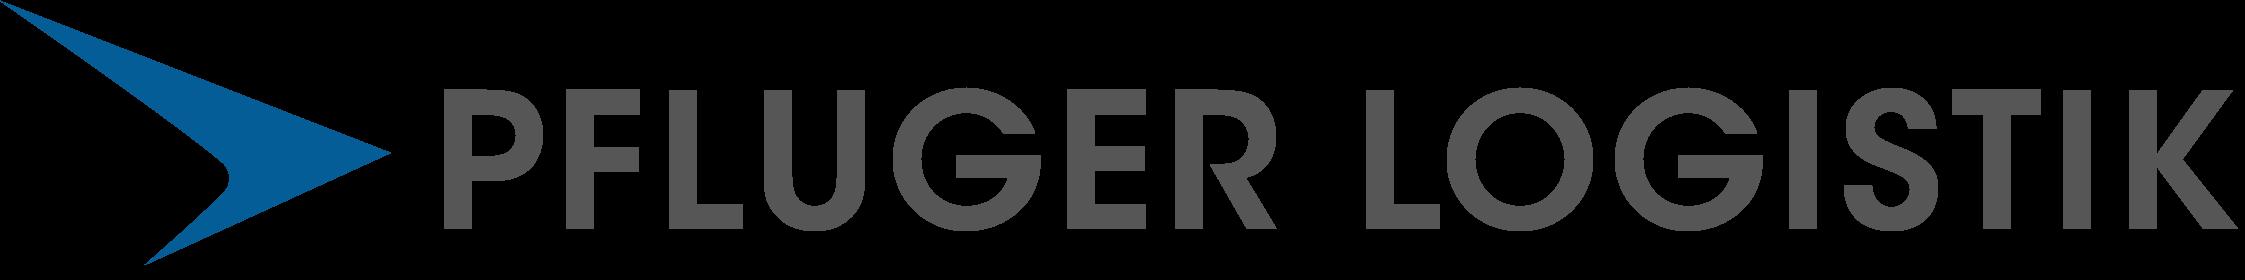 PflugerLogistik